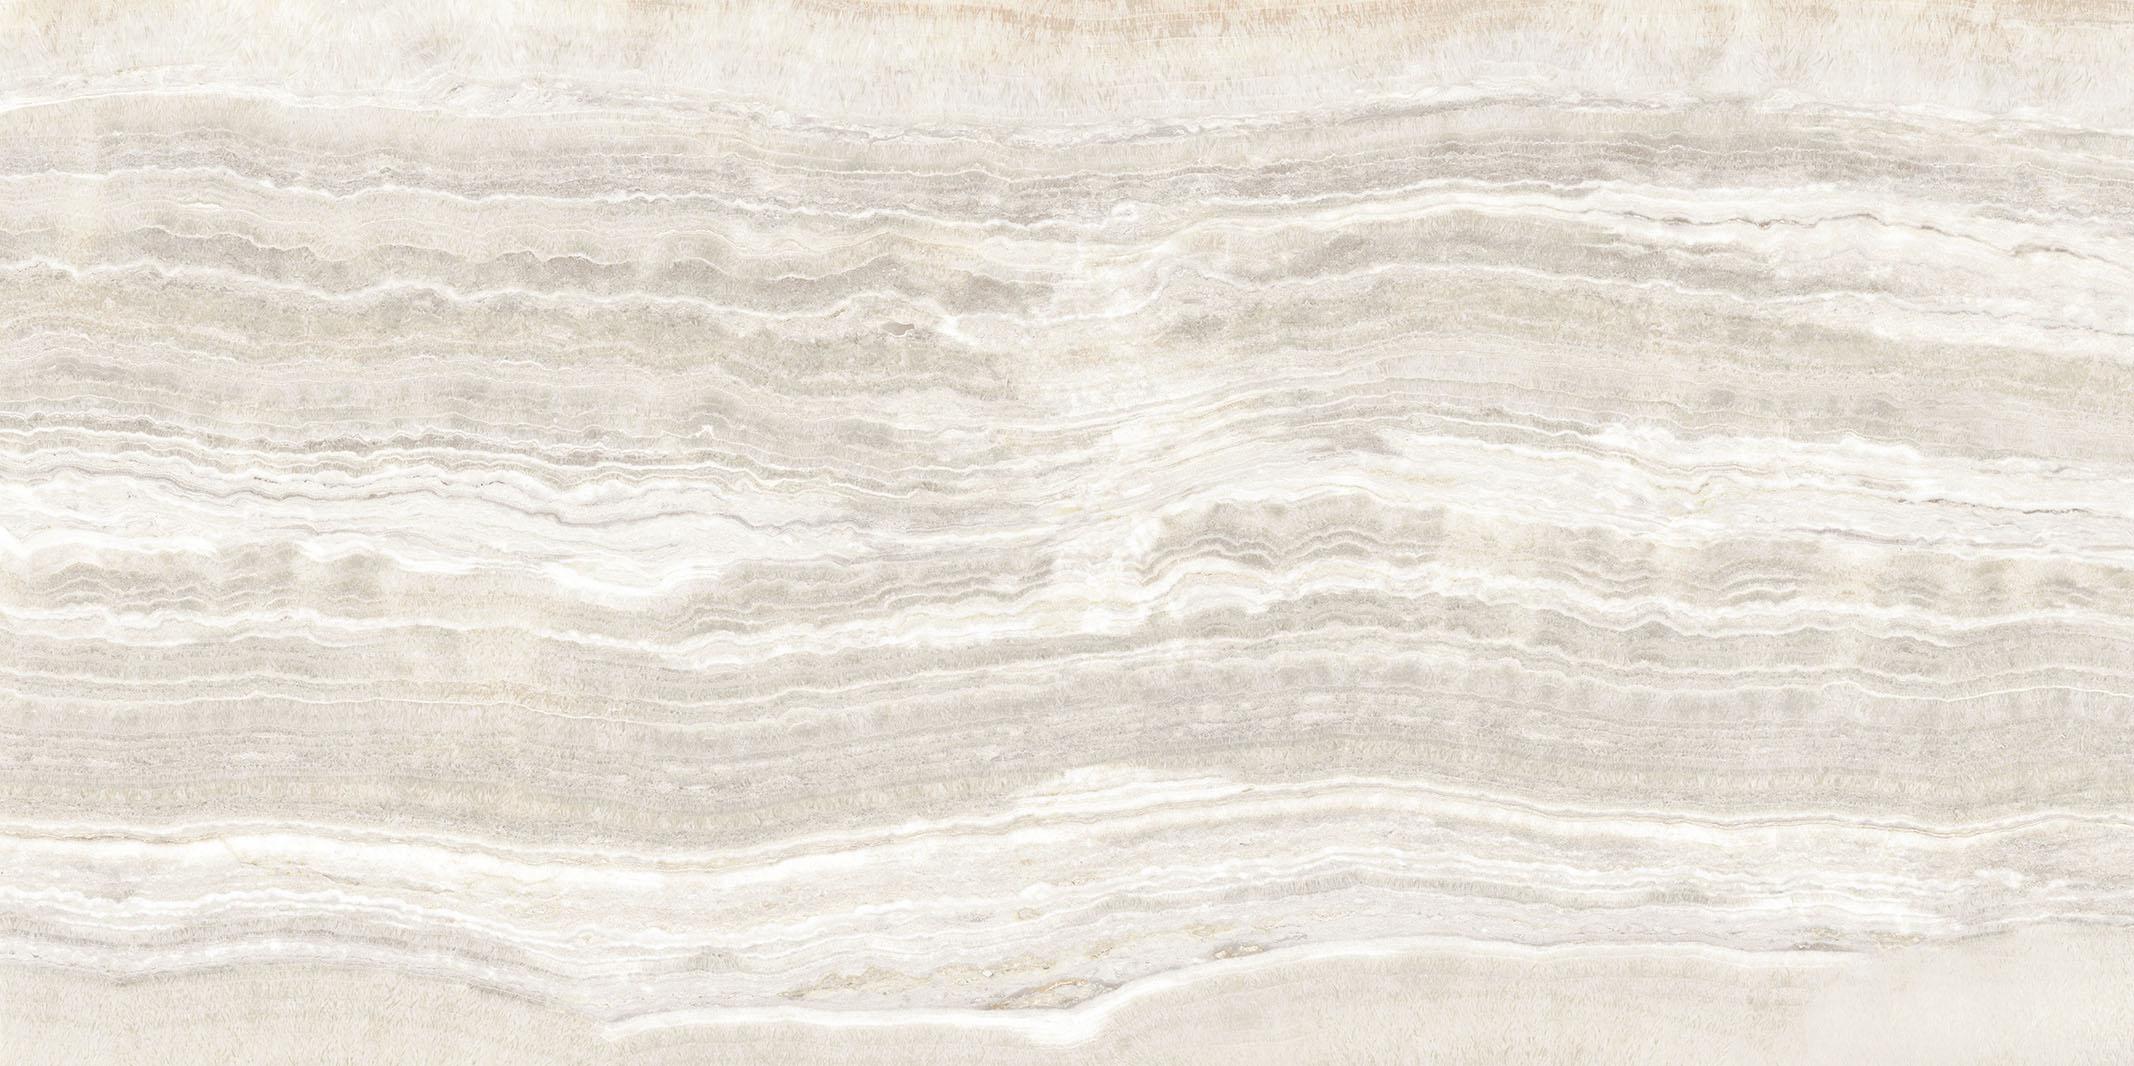 Onyx of Cerim Sand Matte 10mm 60 x 120